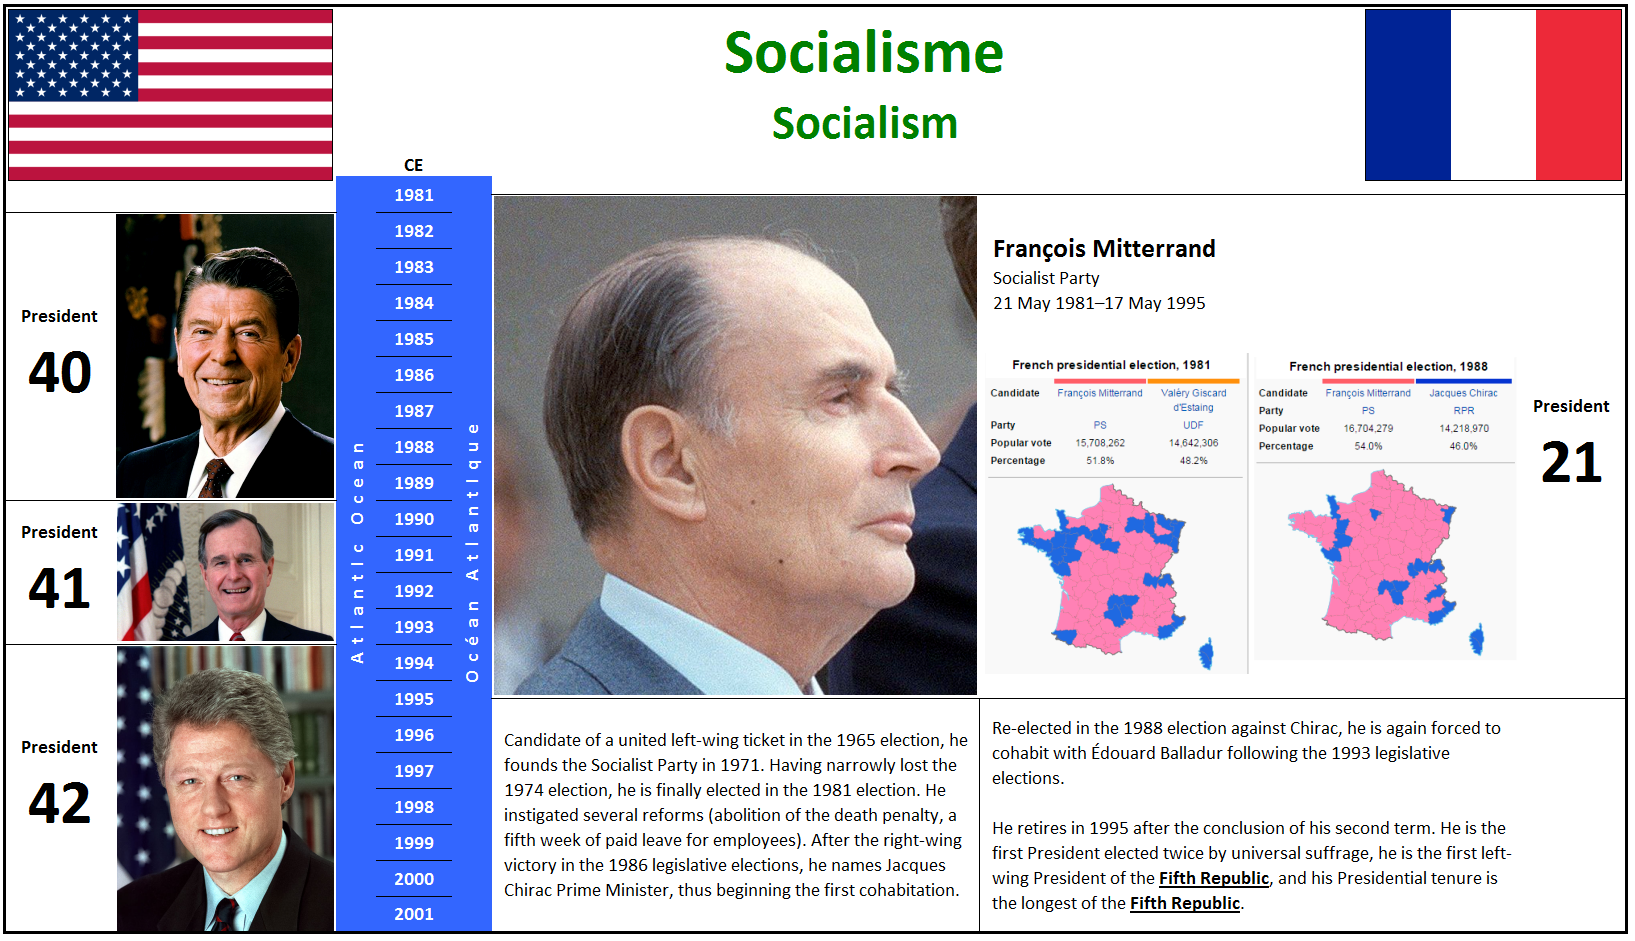 1981 Socialisme